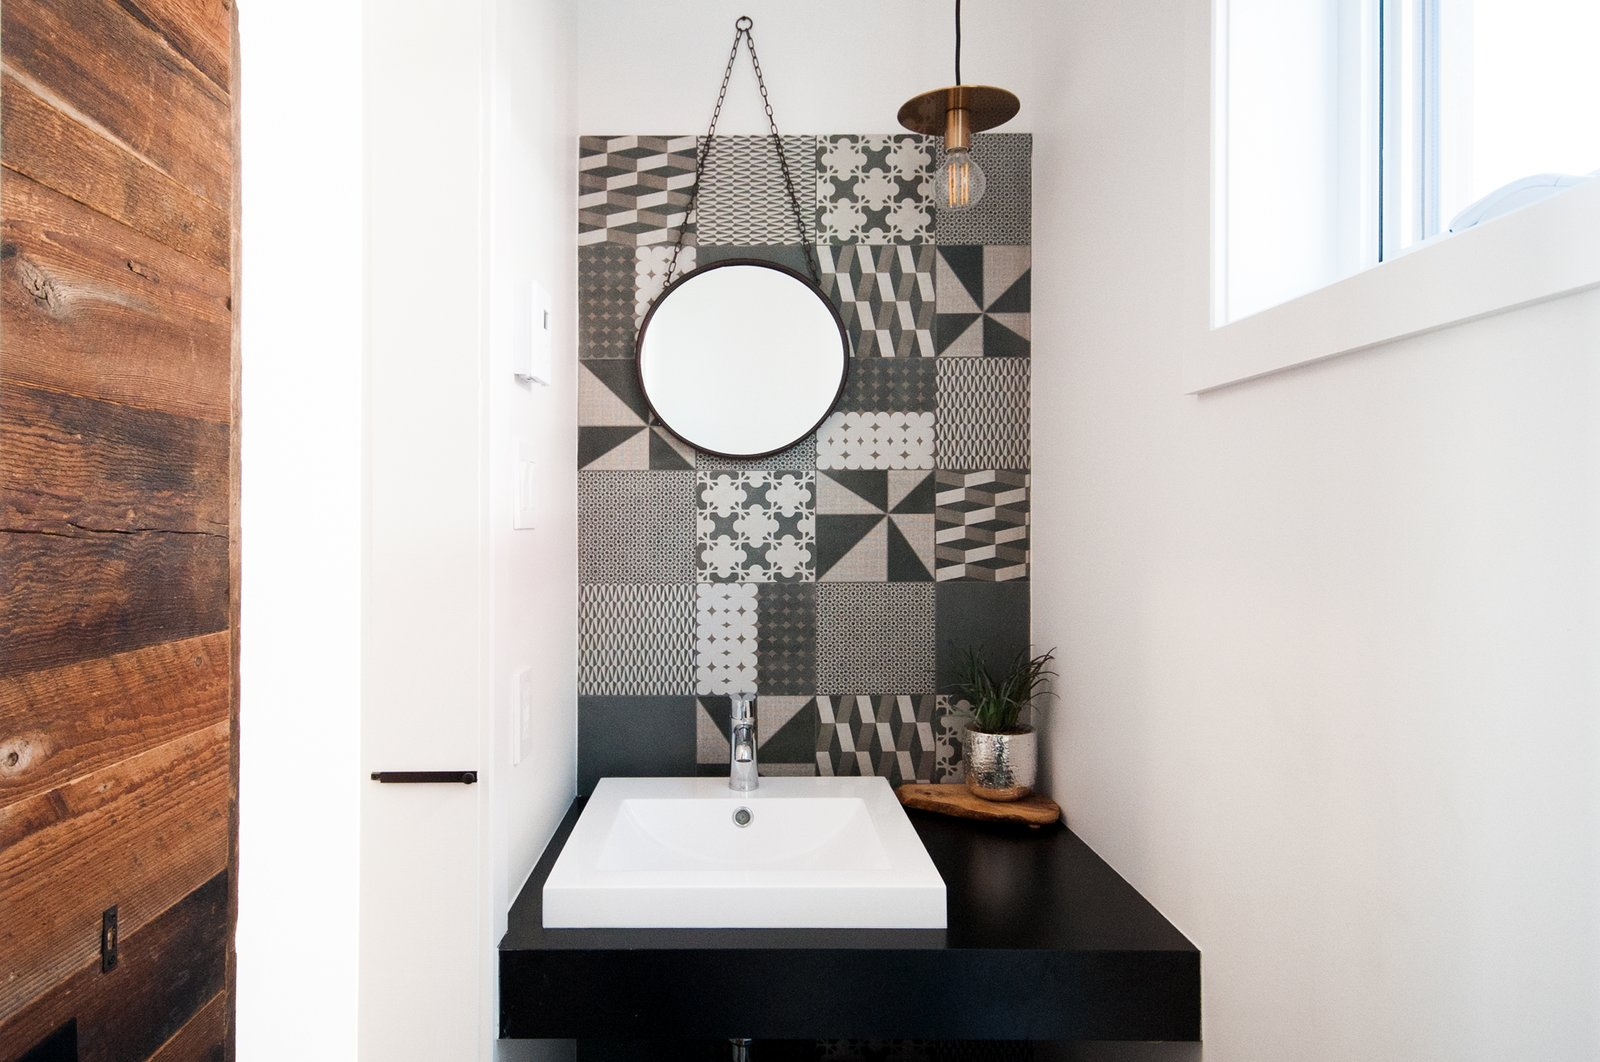 Custom sliding door made with reclaimed wood, tiles by RAMACIERI SOLIGO  Concept DUB House by Concept Dub